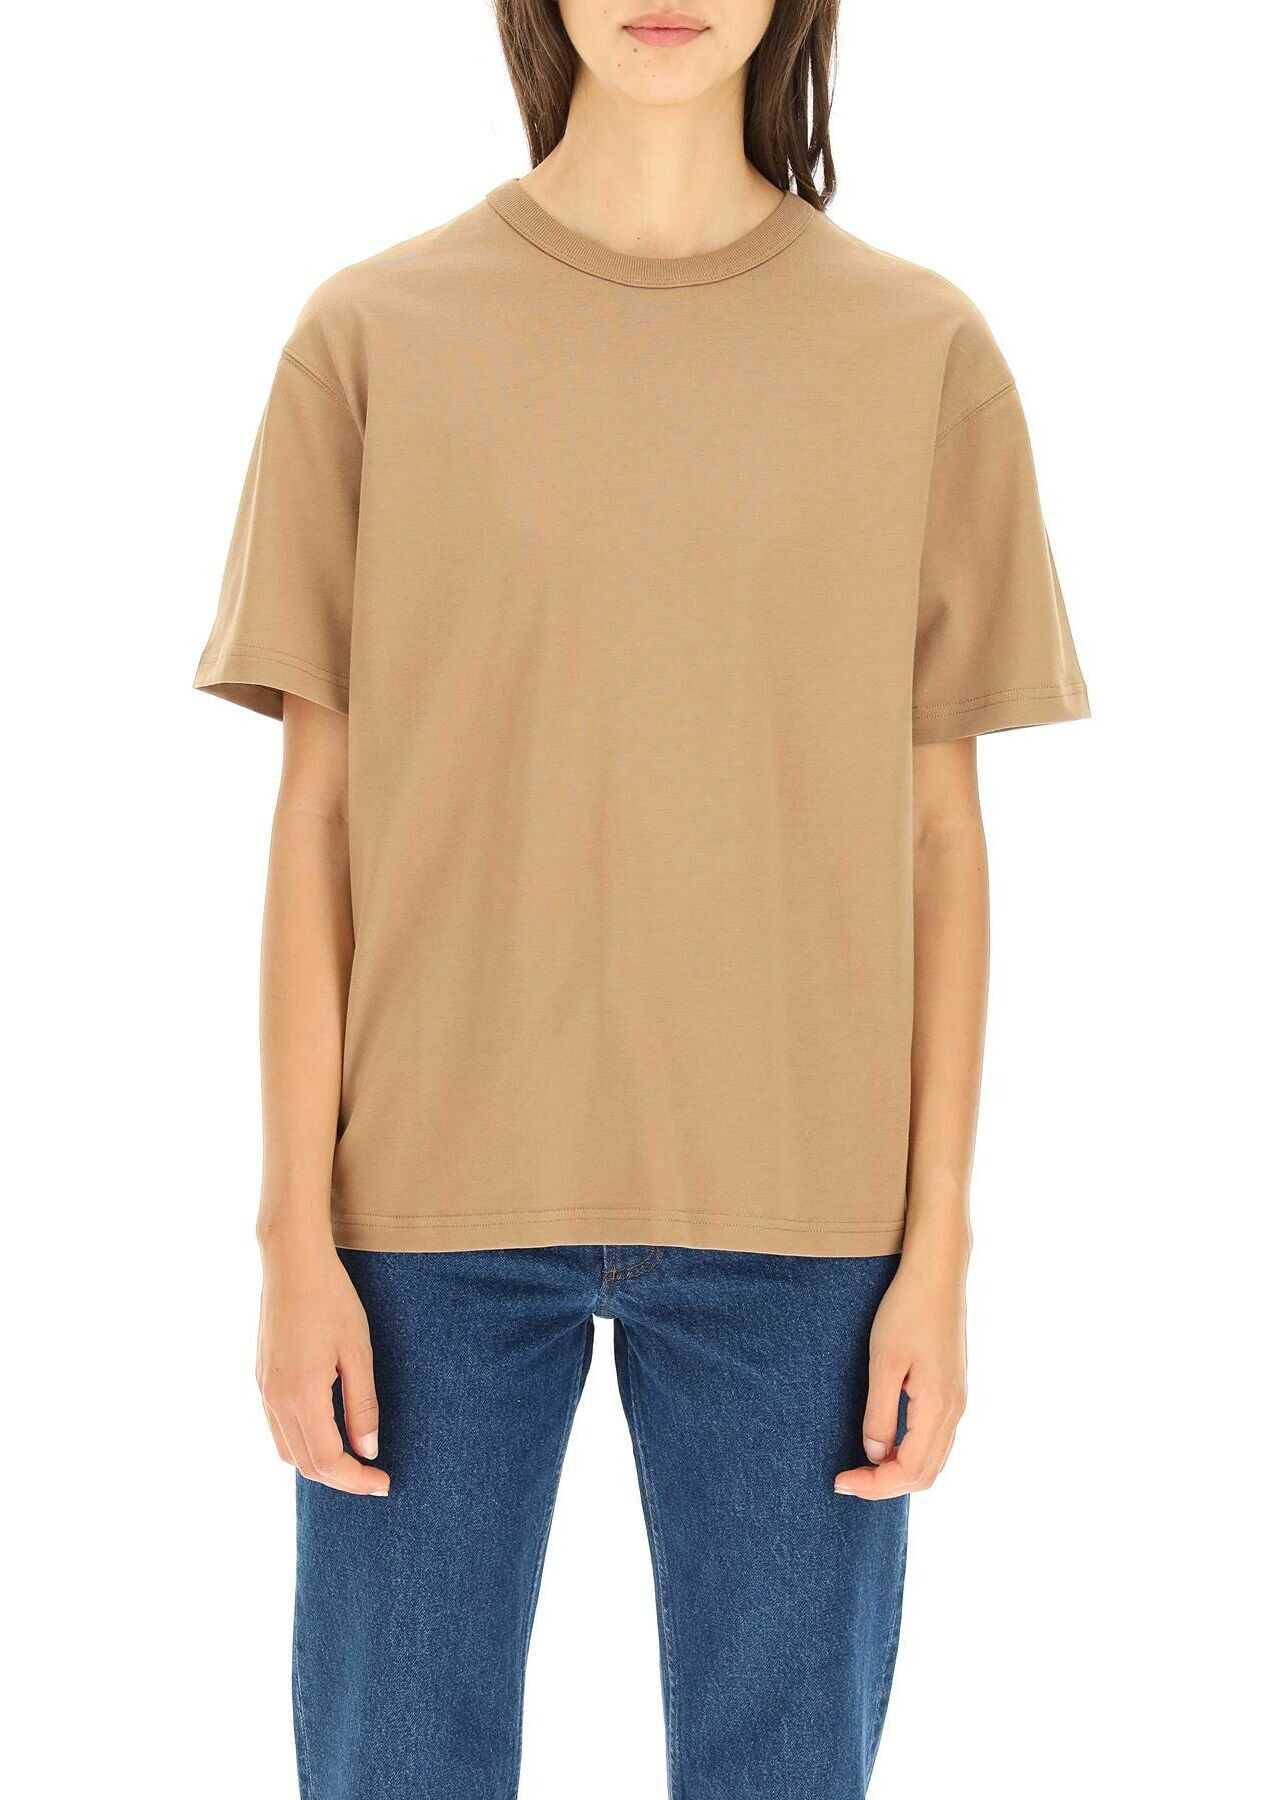 A.P.C. A.p.c. Alma T-Shirt COESE F26042 TABACCO image0